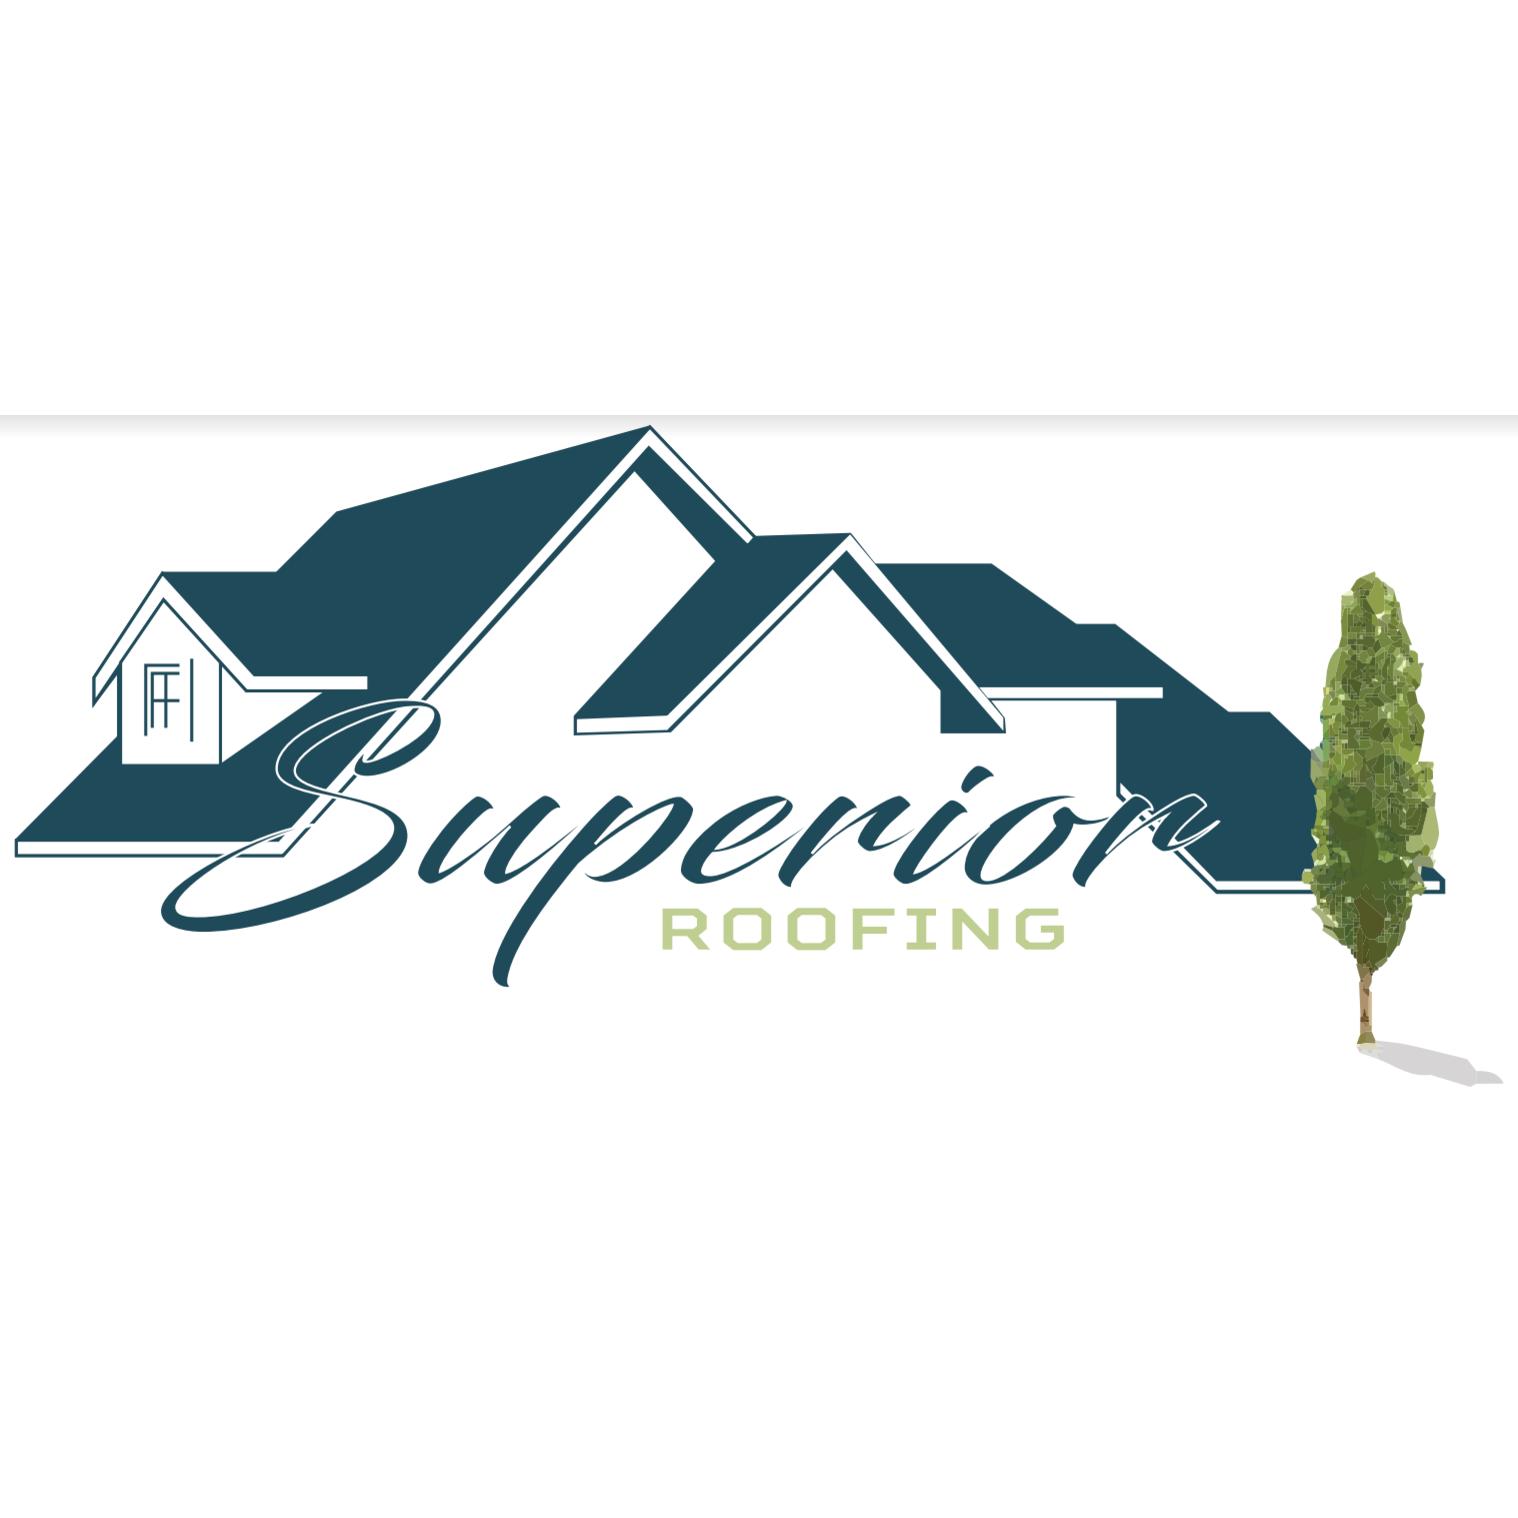 Superior Roofing Phenix City Logo